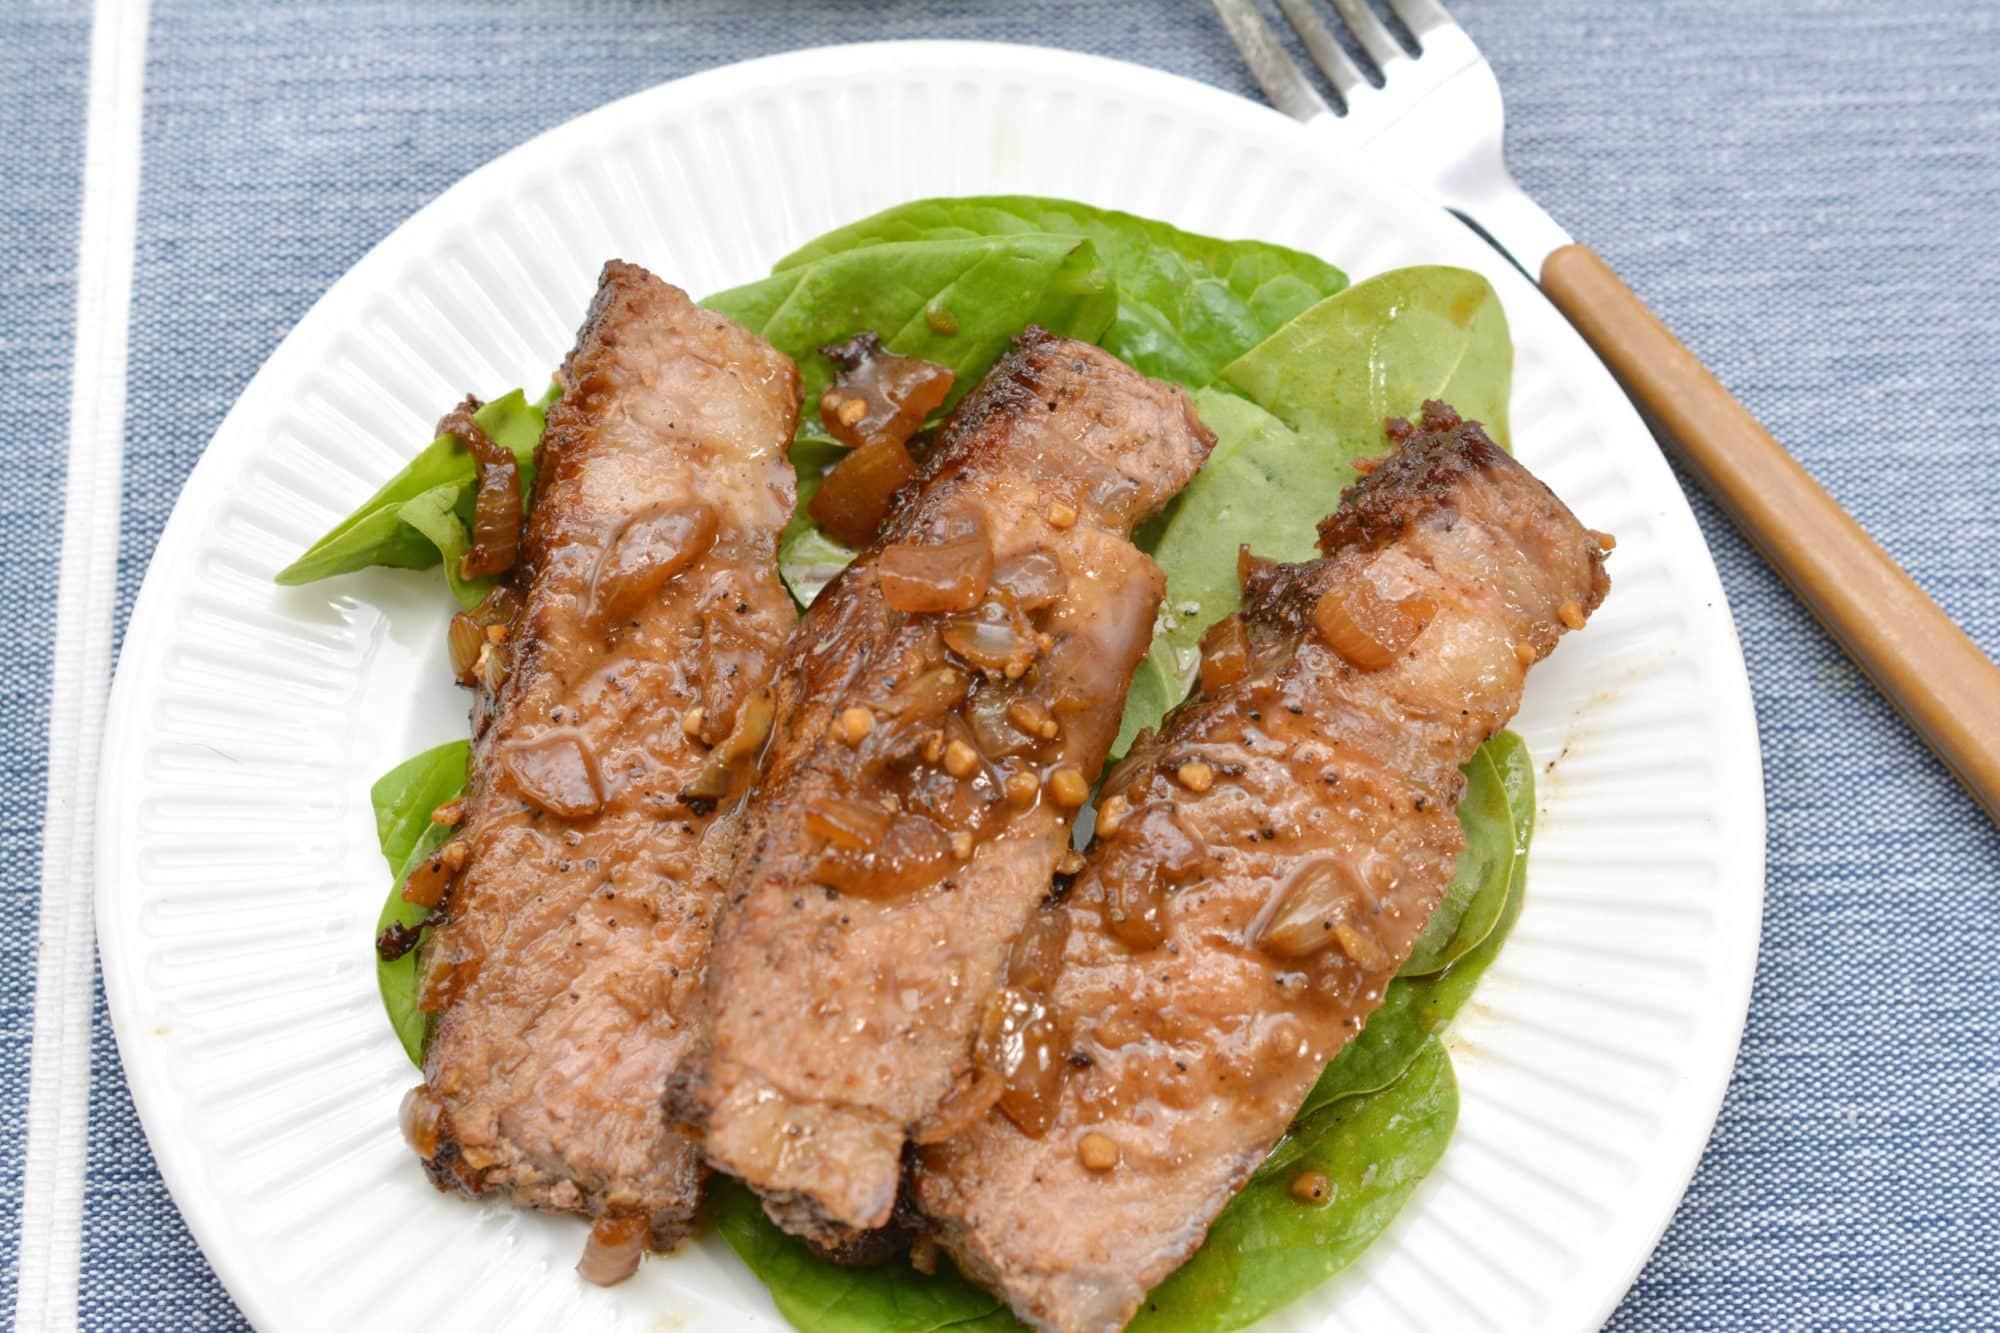 Keto Dinner Recipes Beef Steak  Keto Steak Recipe Seared Ribeye with Red Wine Pan Gravy